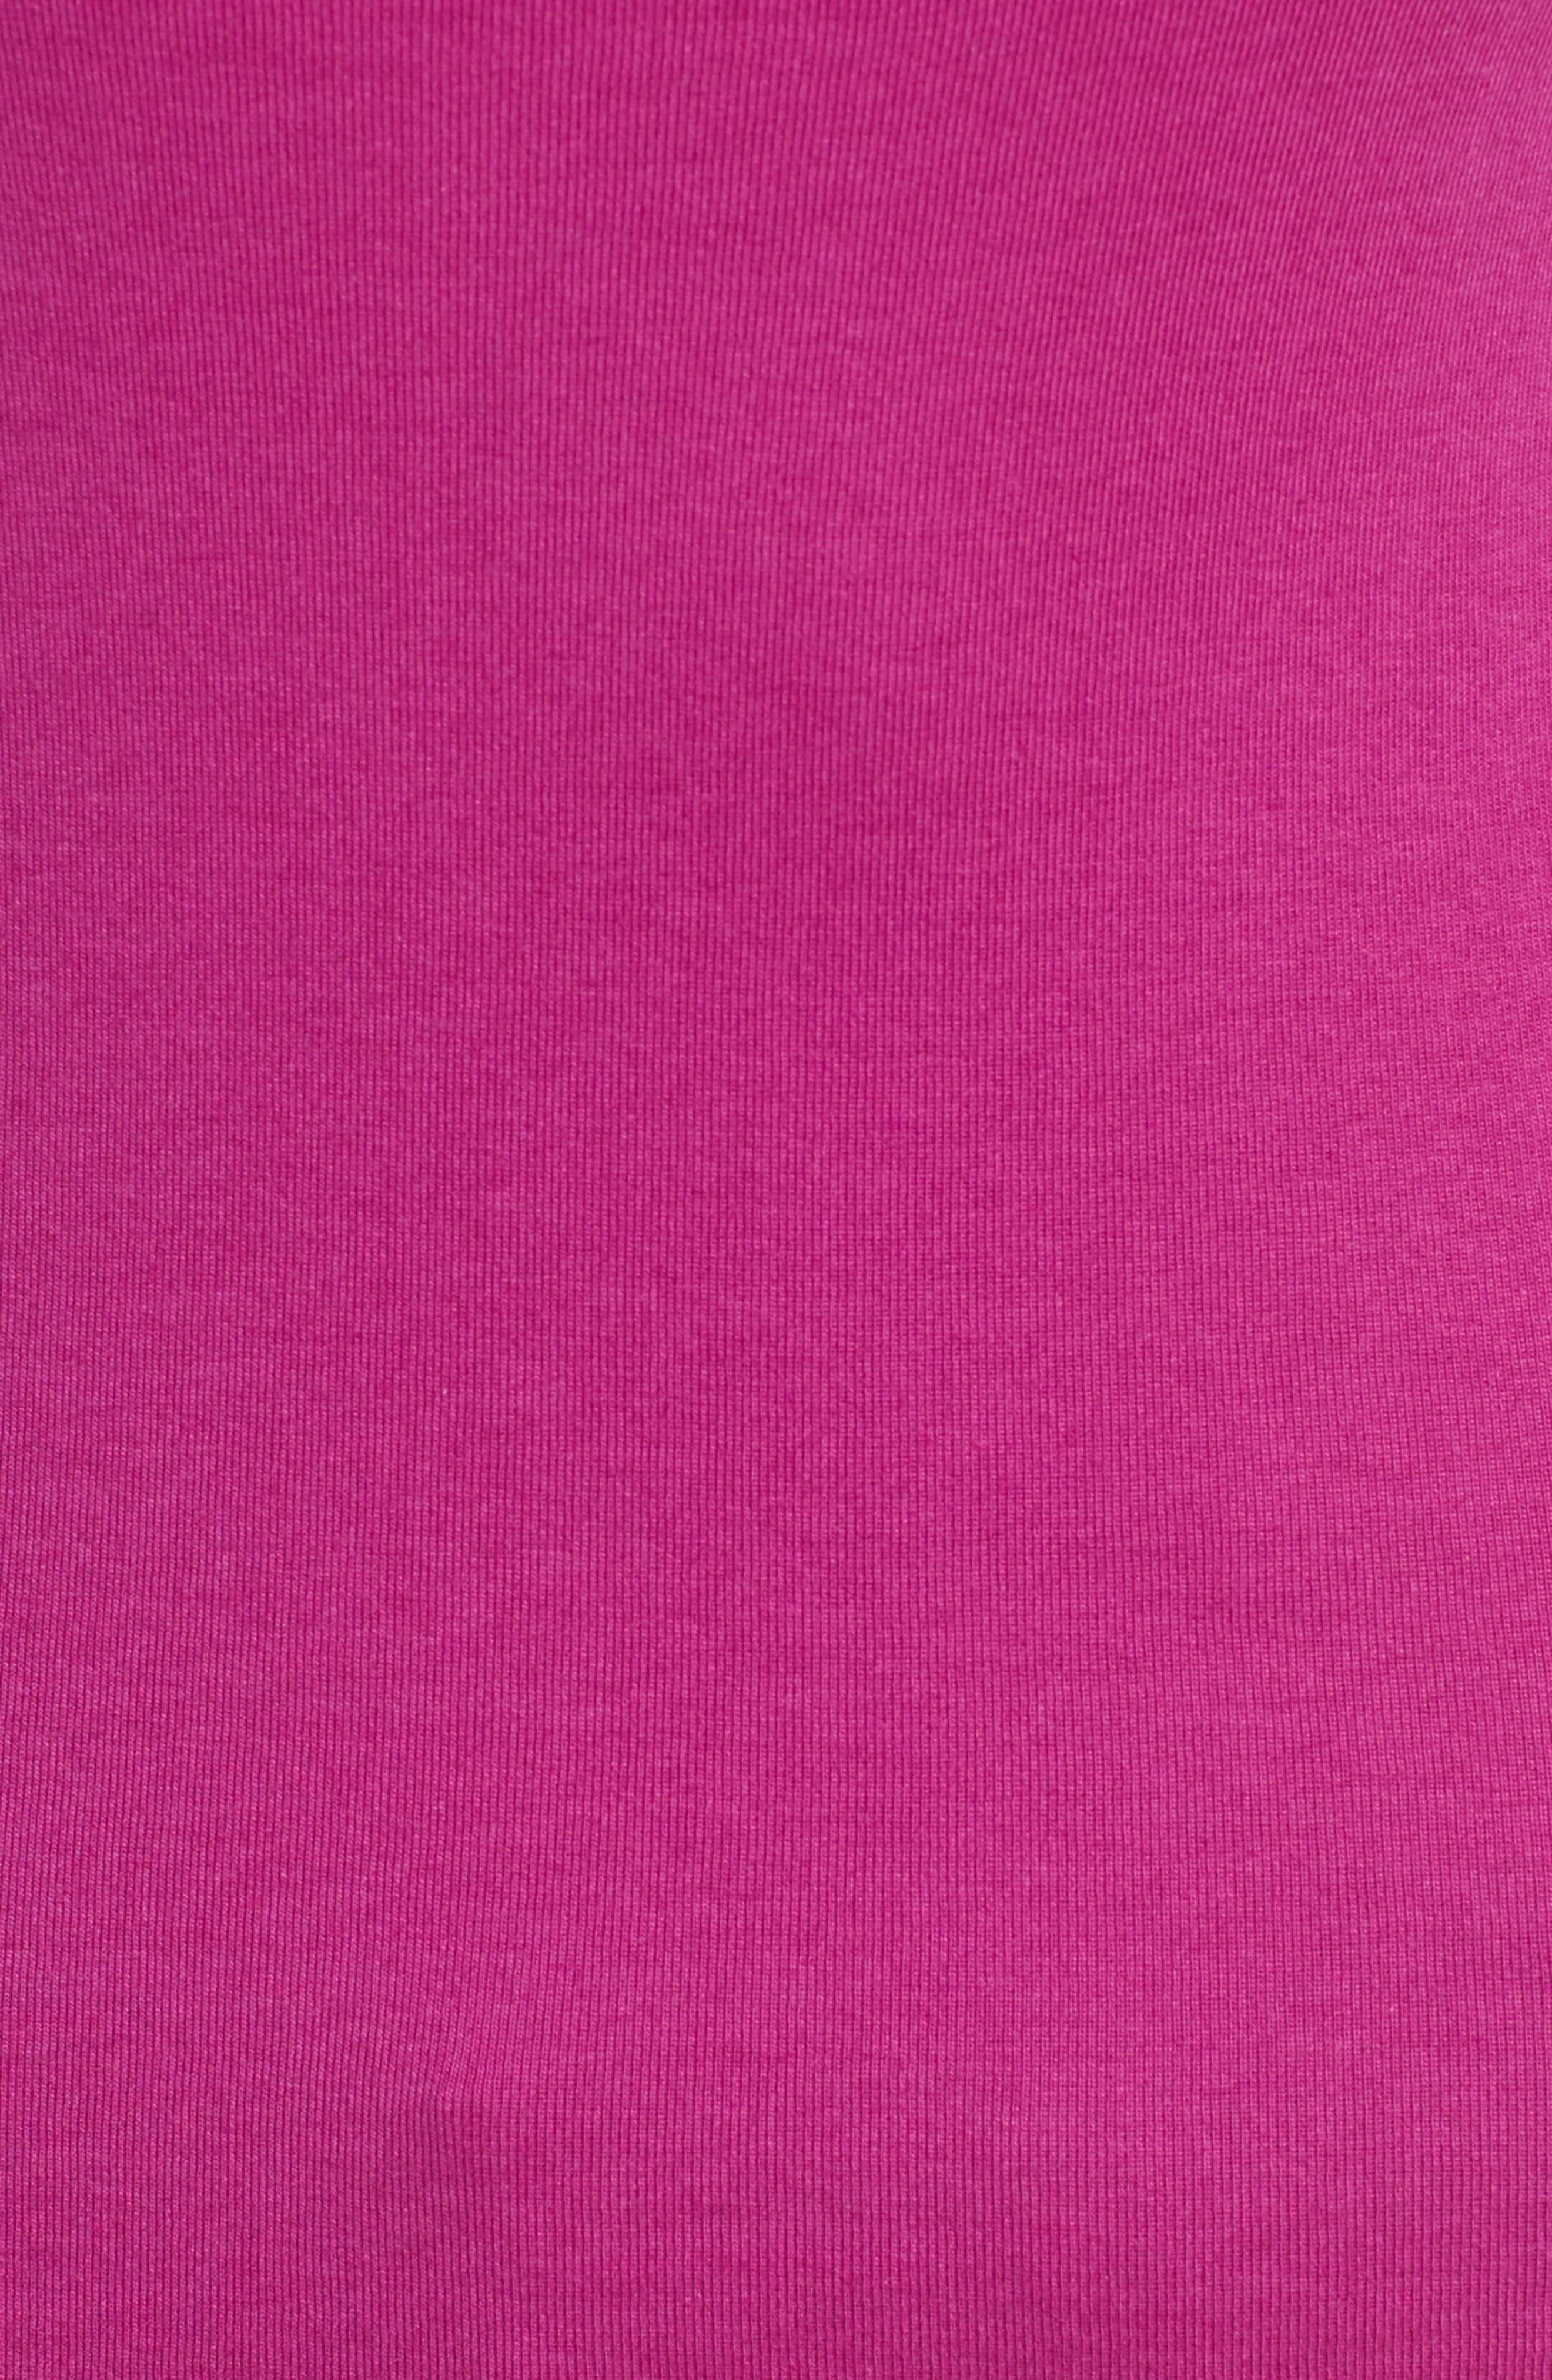 Ballet Neck Cotton & Modal Knit Elbow Sleeve Tee,                             Alternate thumbnail 291, color,